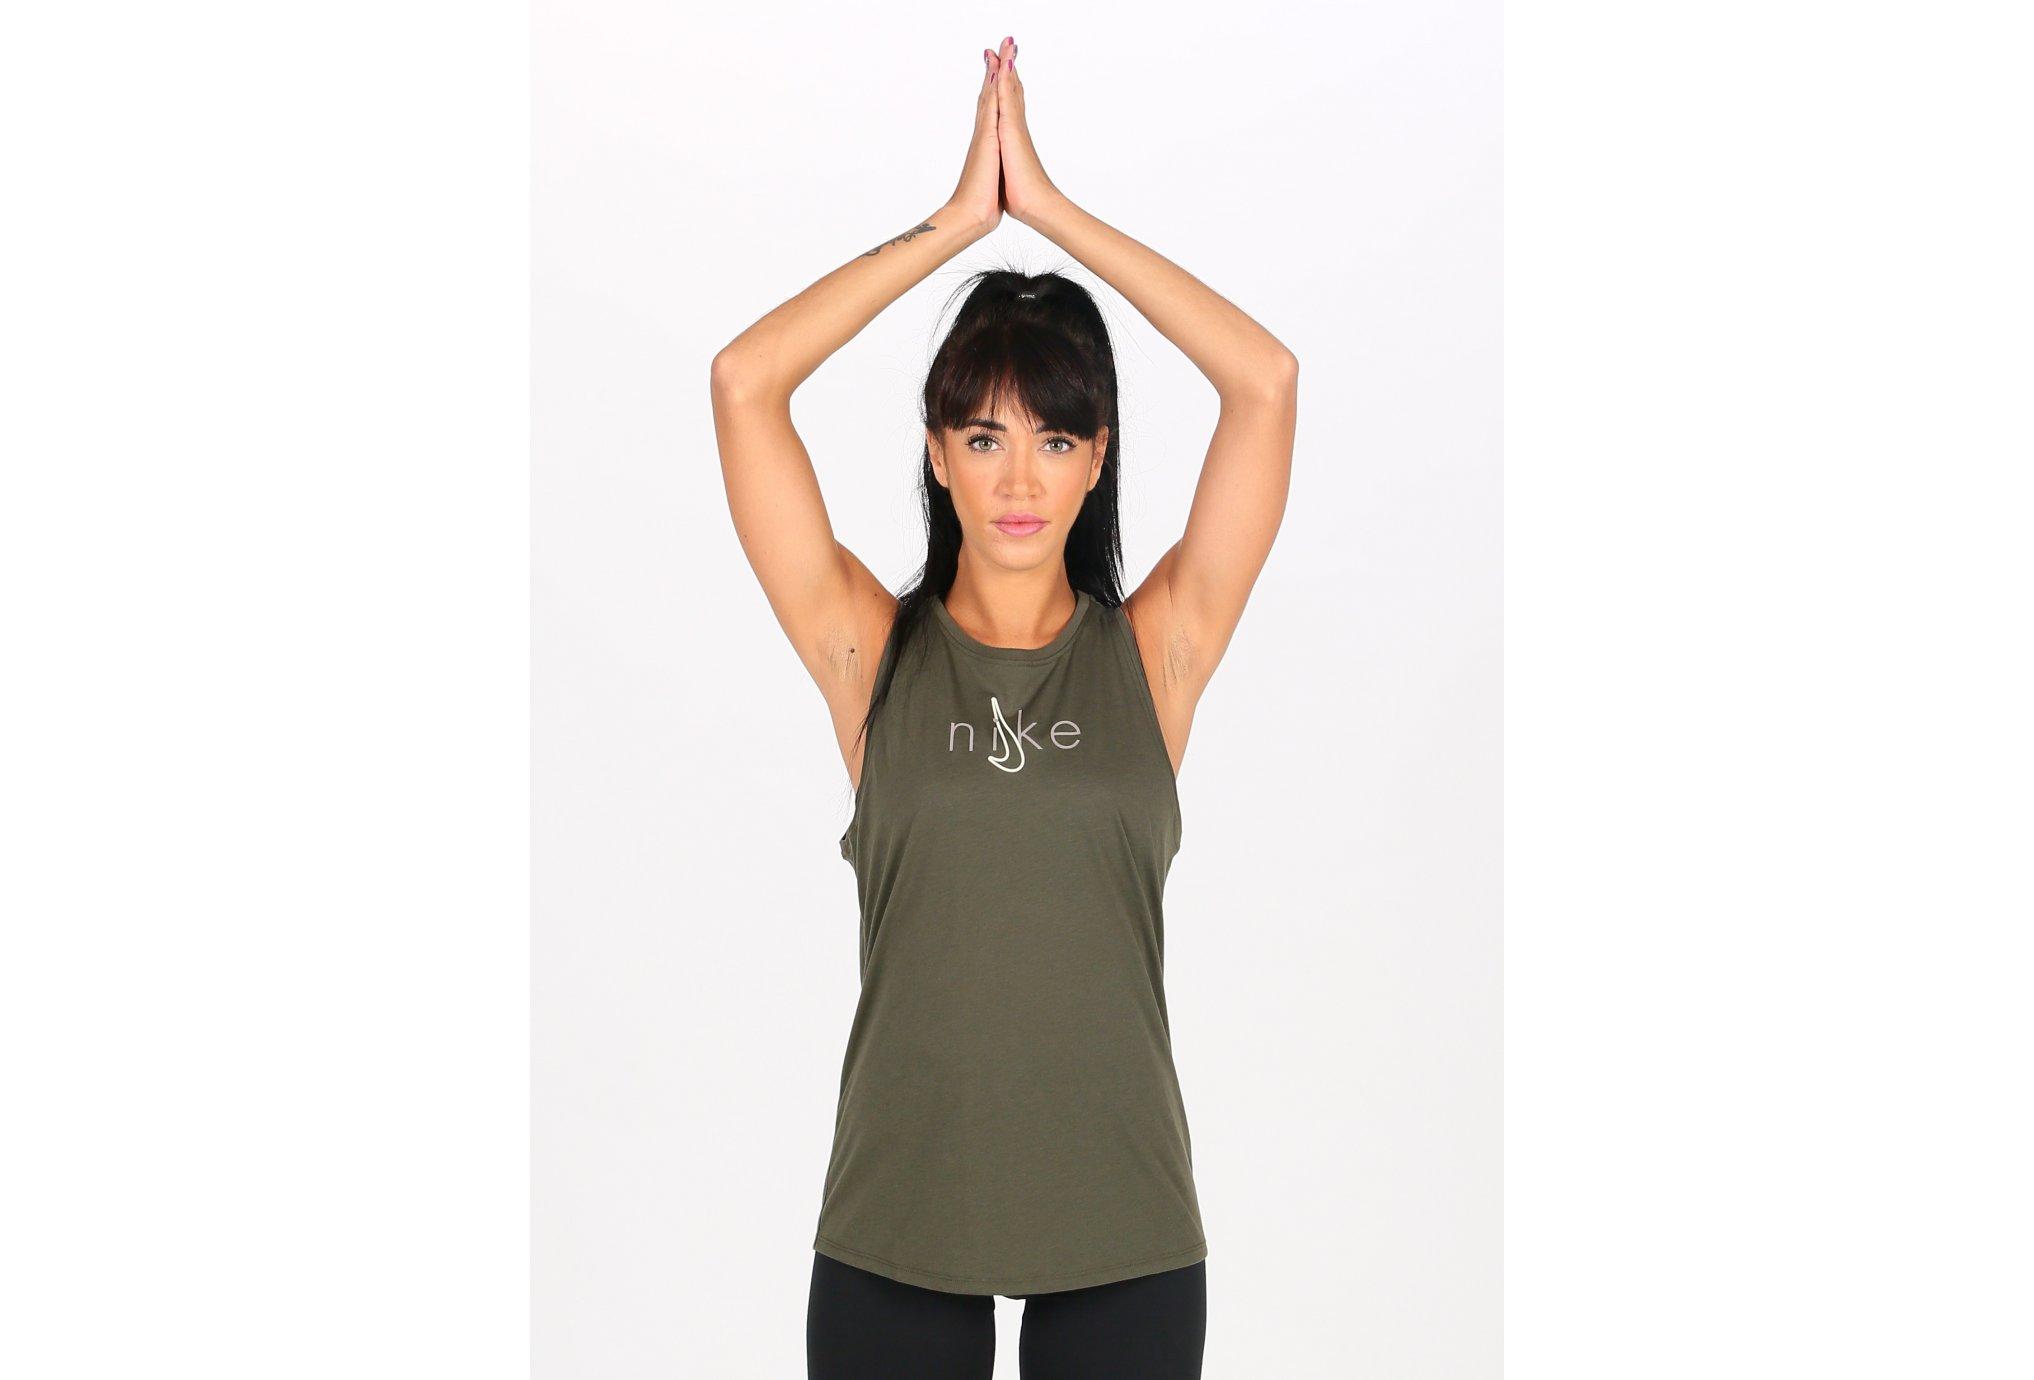 Nike Dry Tank Yoga W vêtement running femme